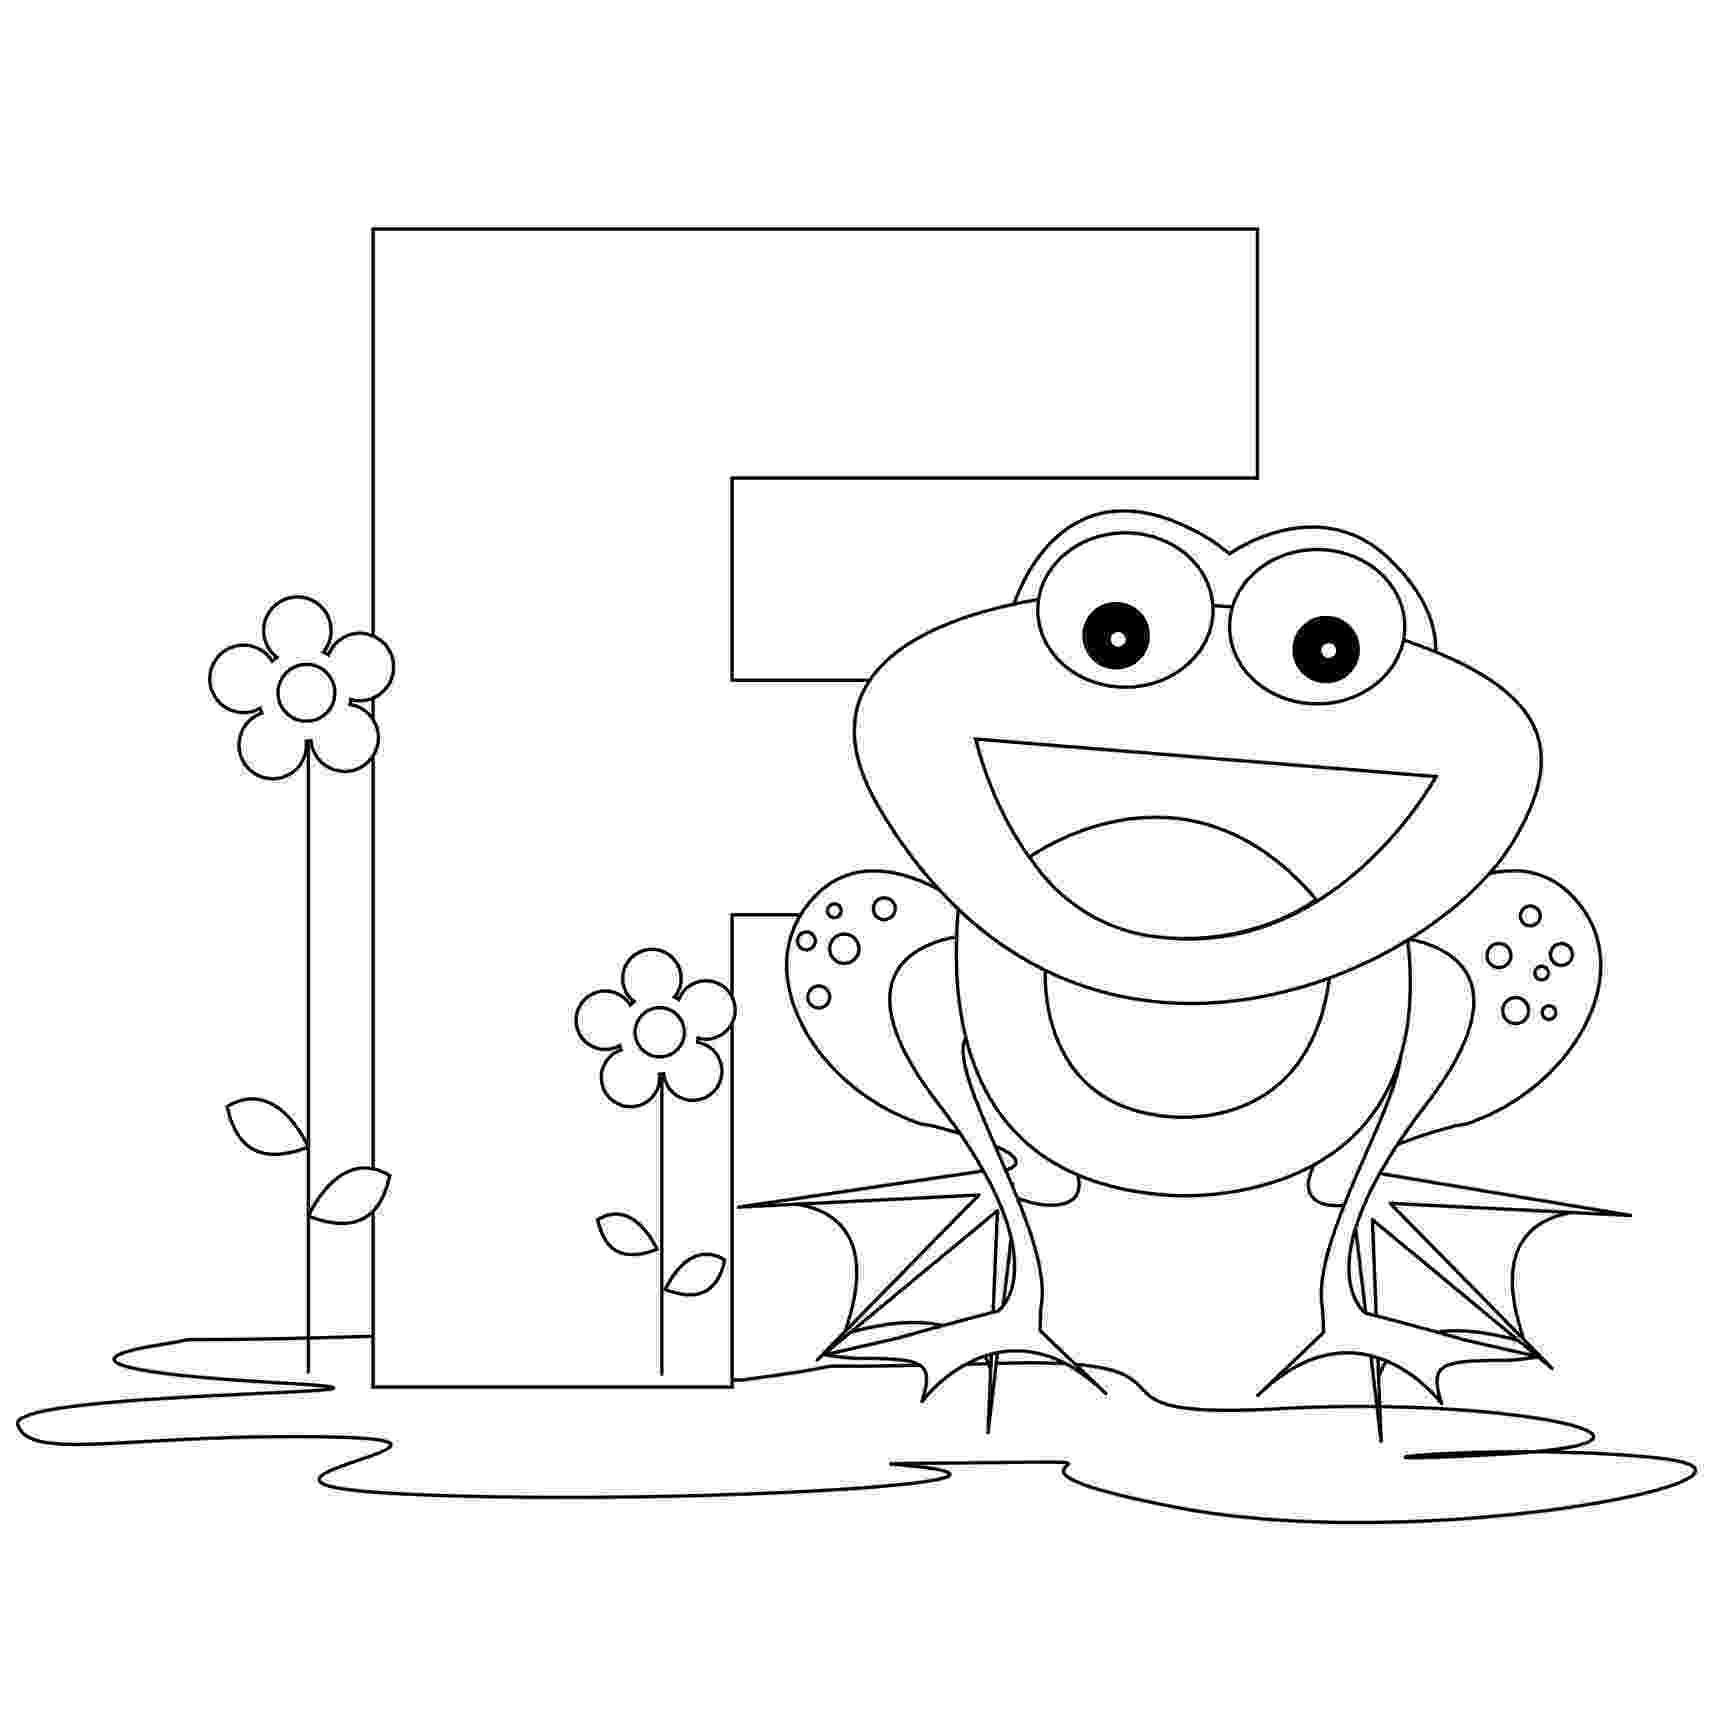 abc coloring sheets free printable alphabet coloring pages for kids best coloring sheets abc 1 2